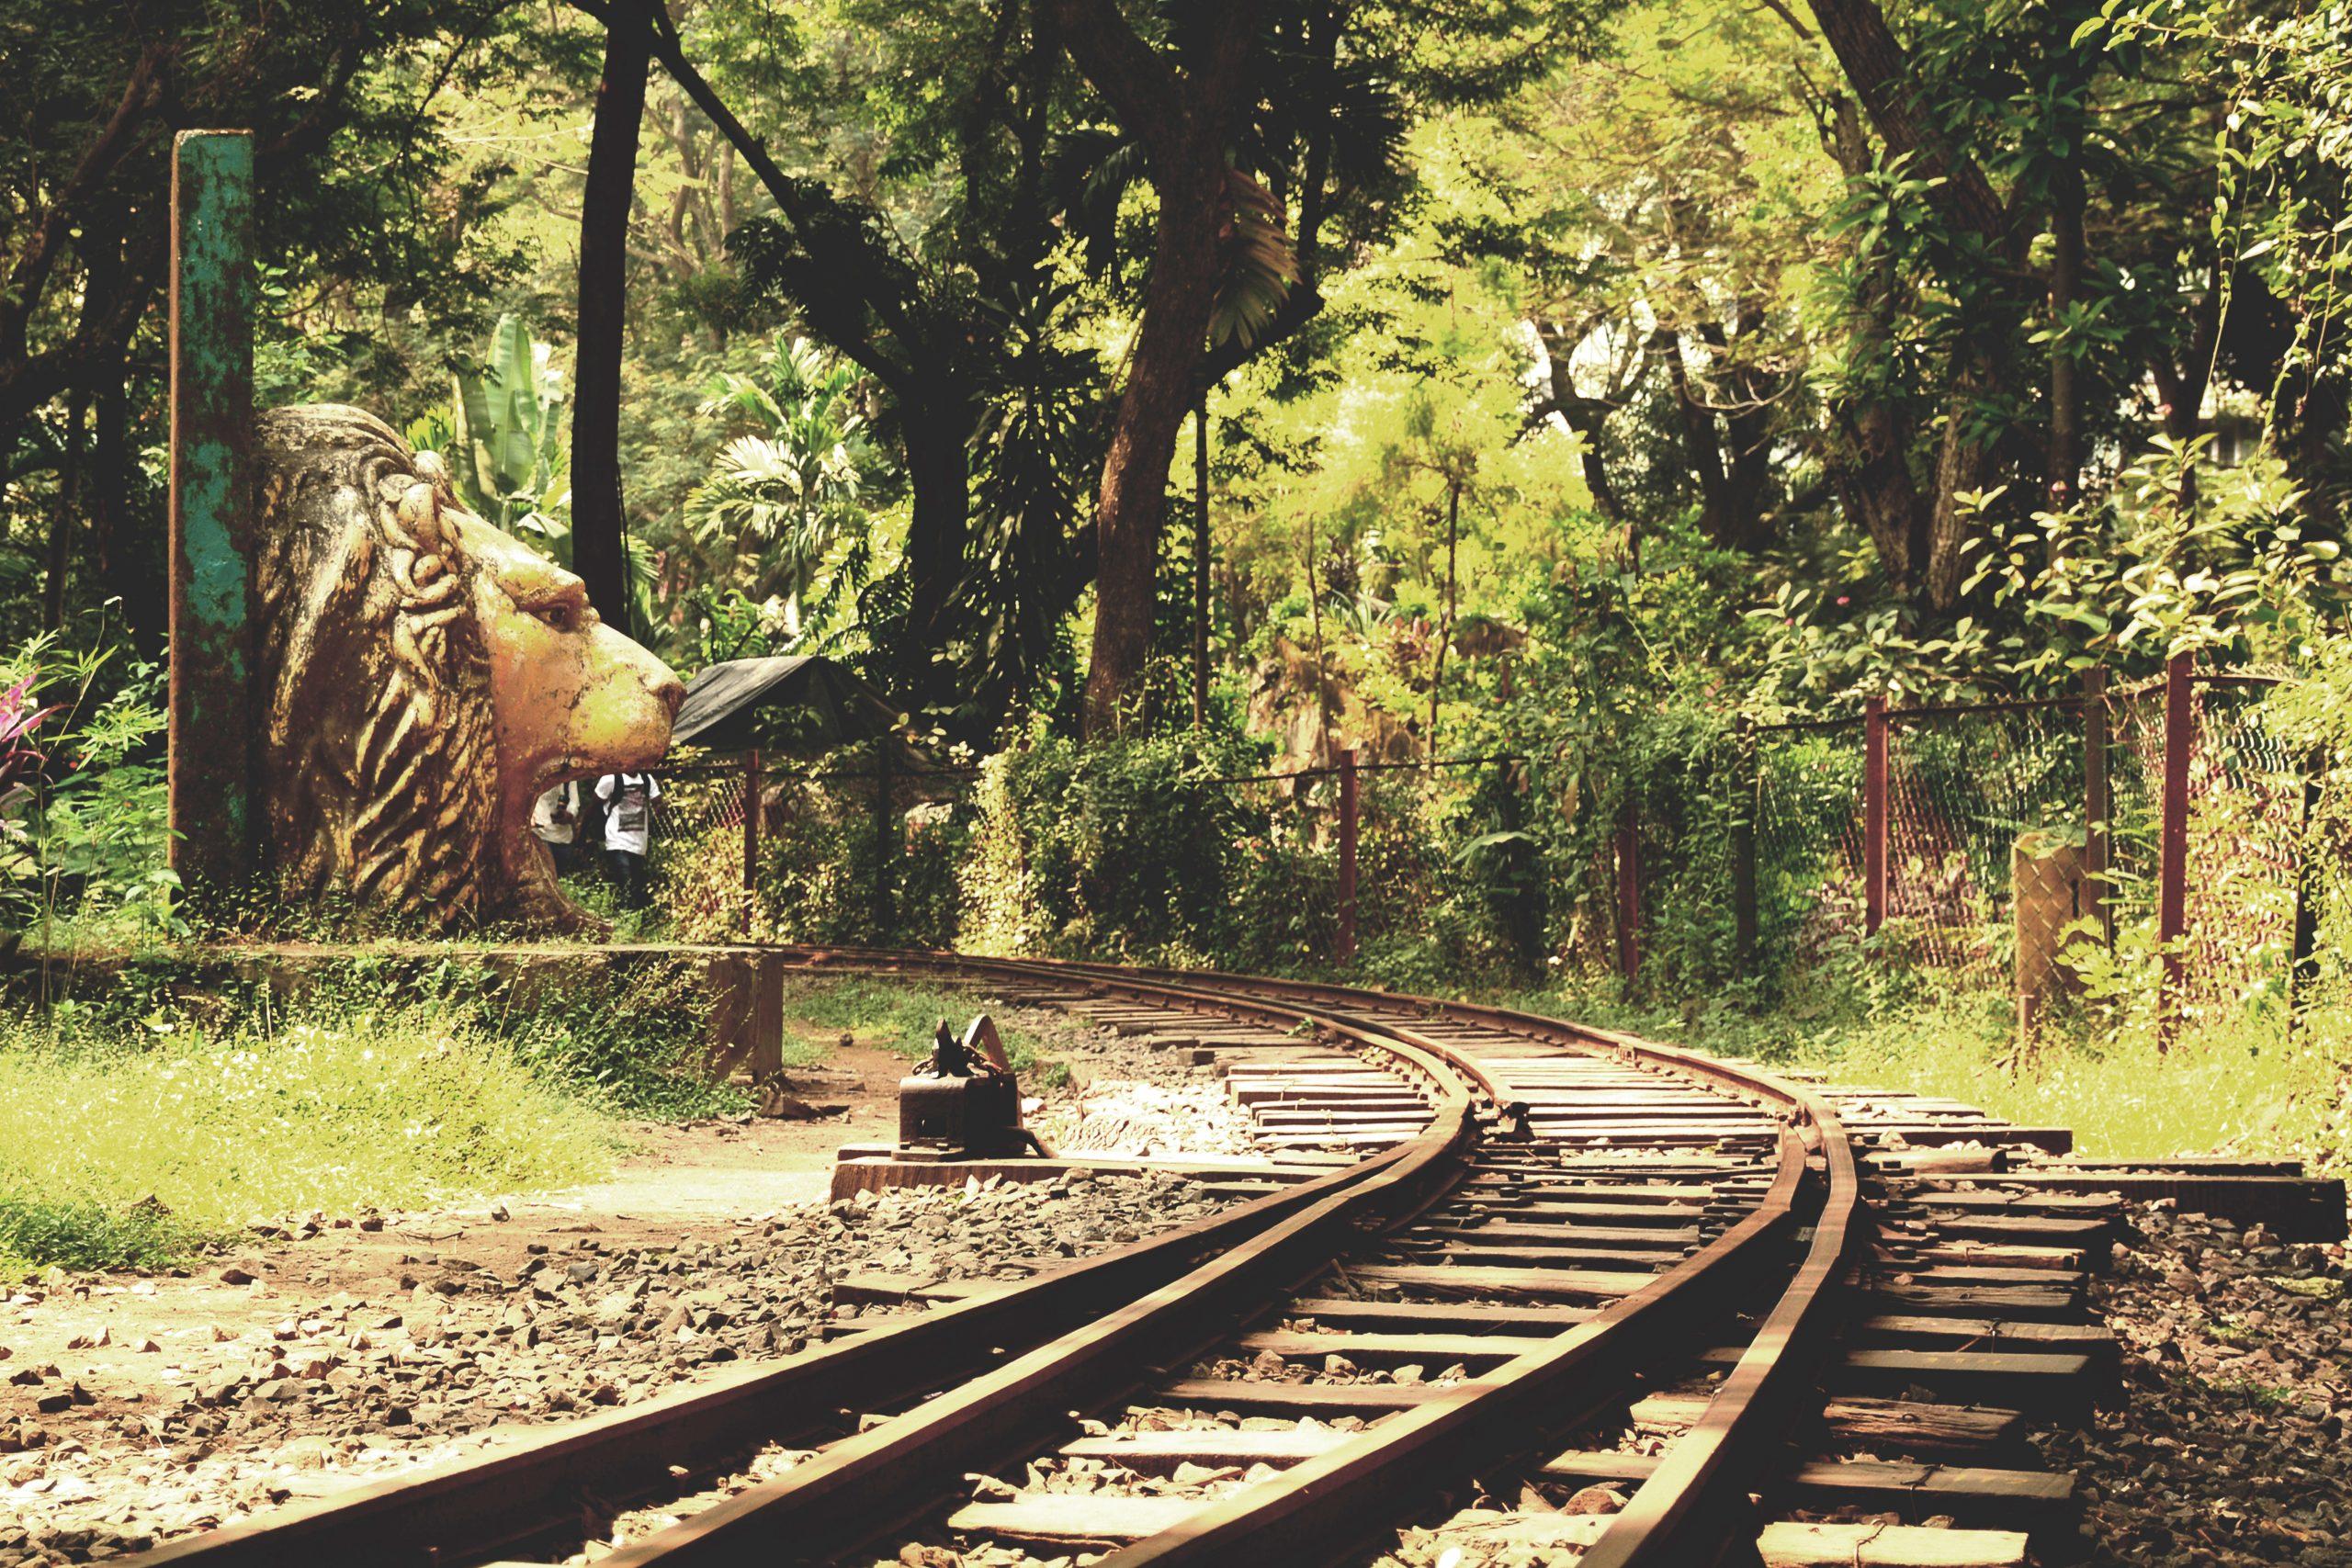 Toy Train Track, Sanjay Gandhi National Park